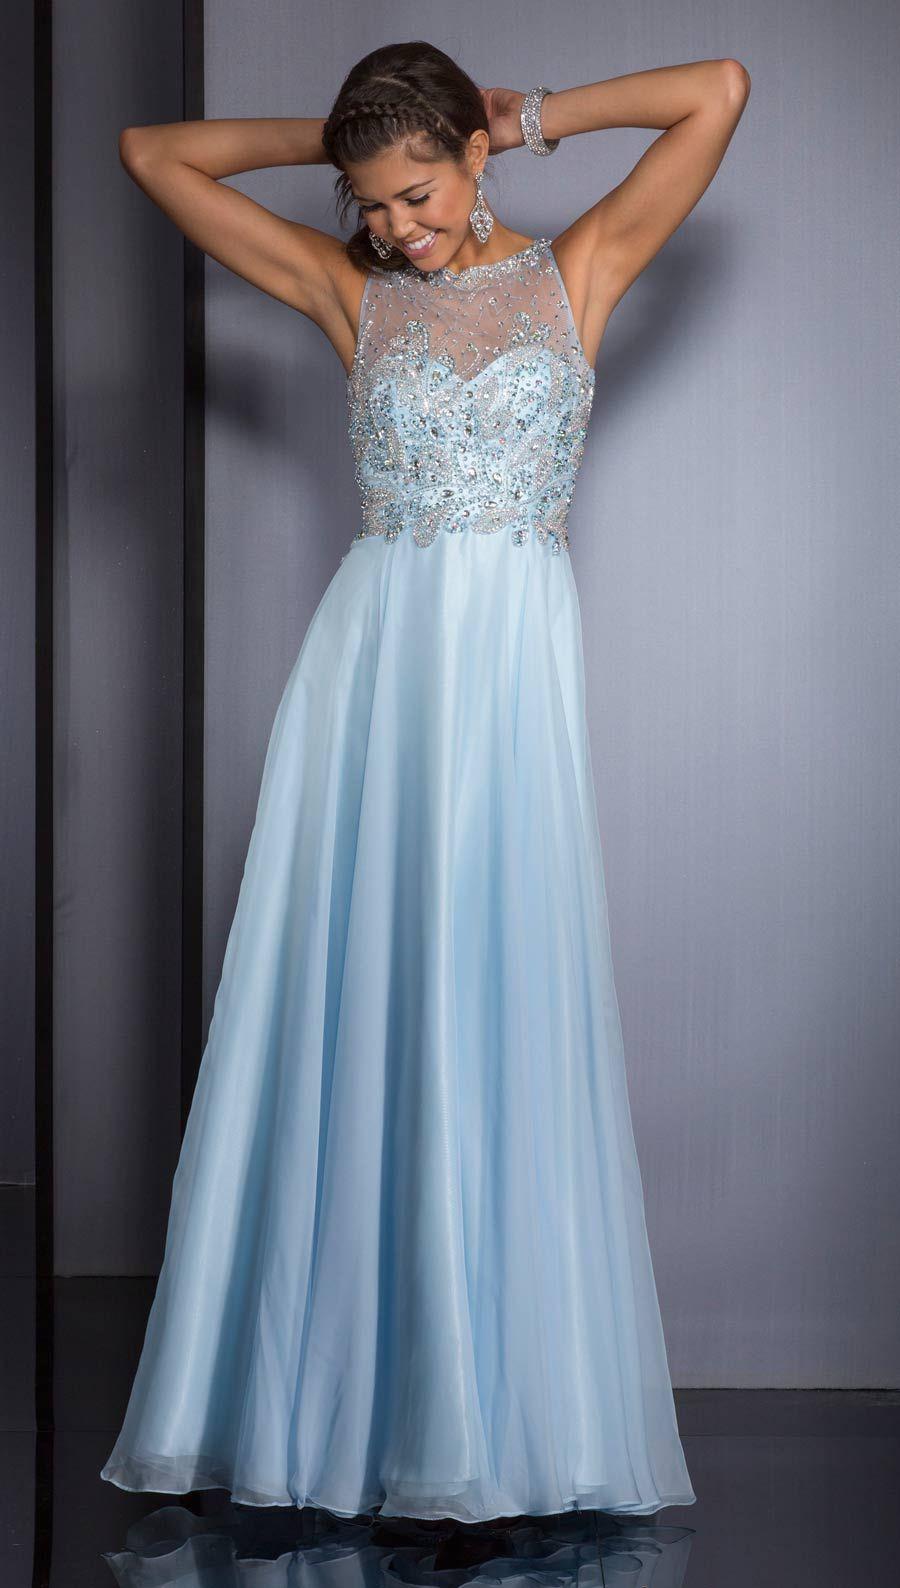 Nice The Princess Diaries 2 Wedding Dress Elaboration - All Wedding ...